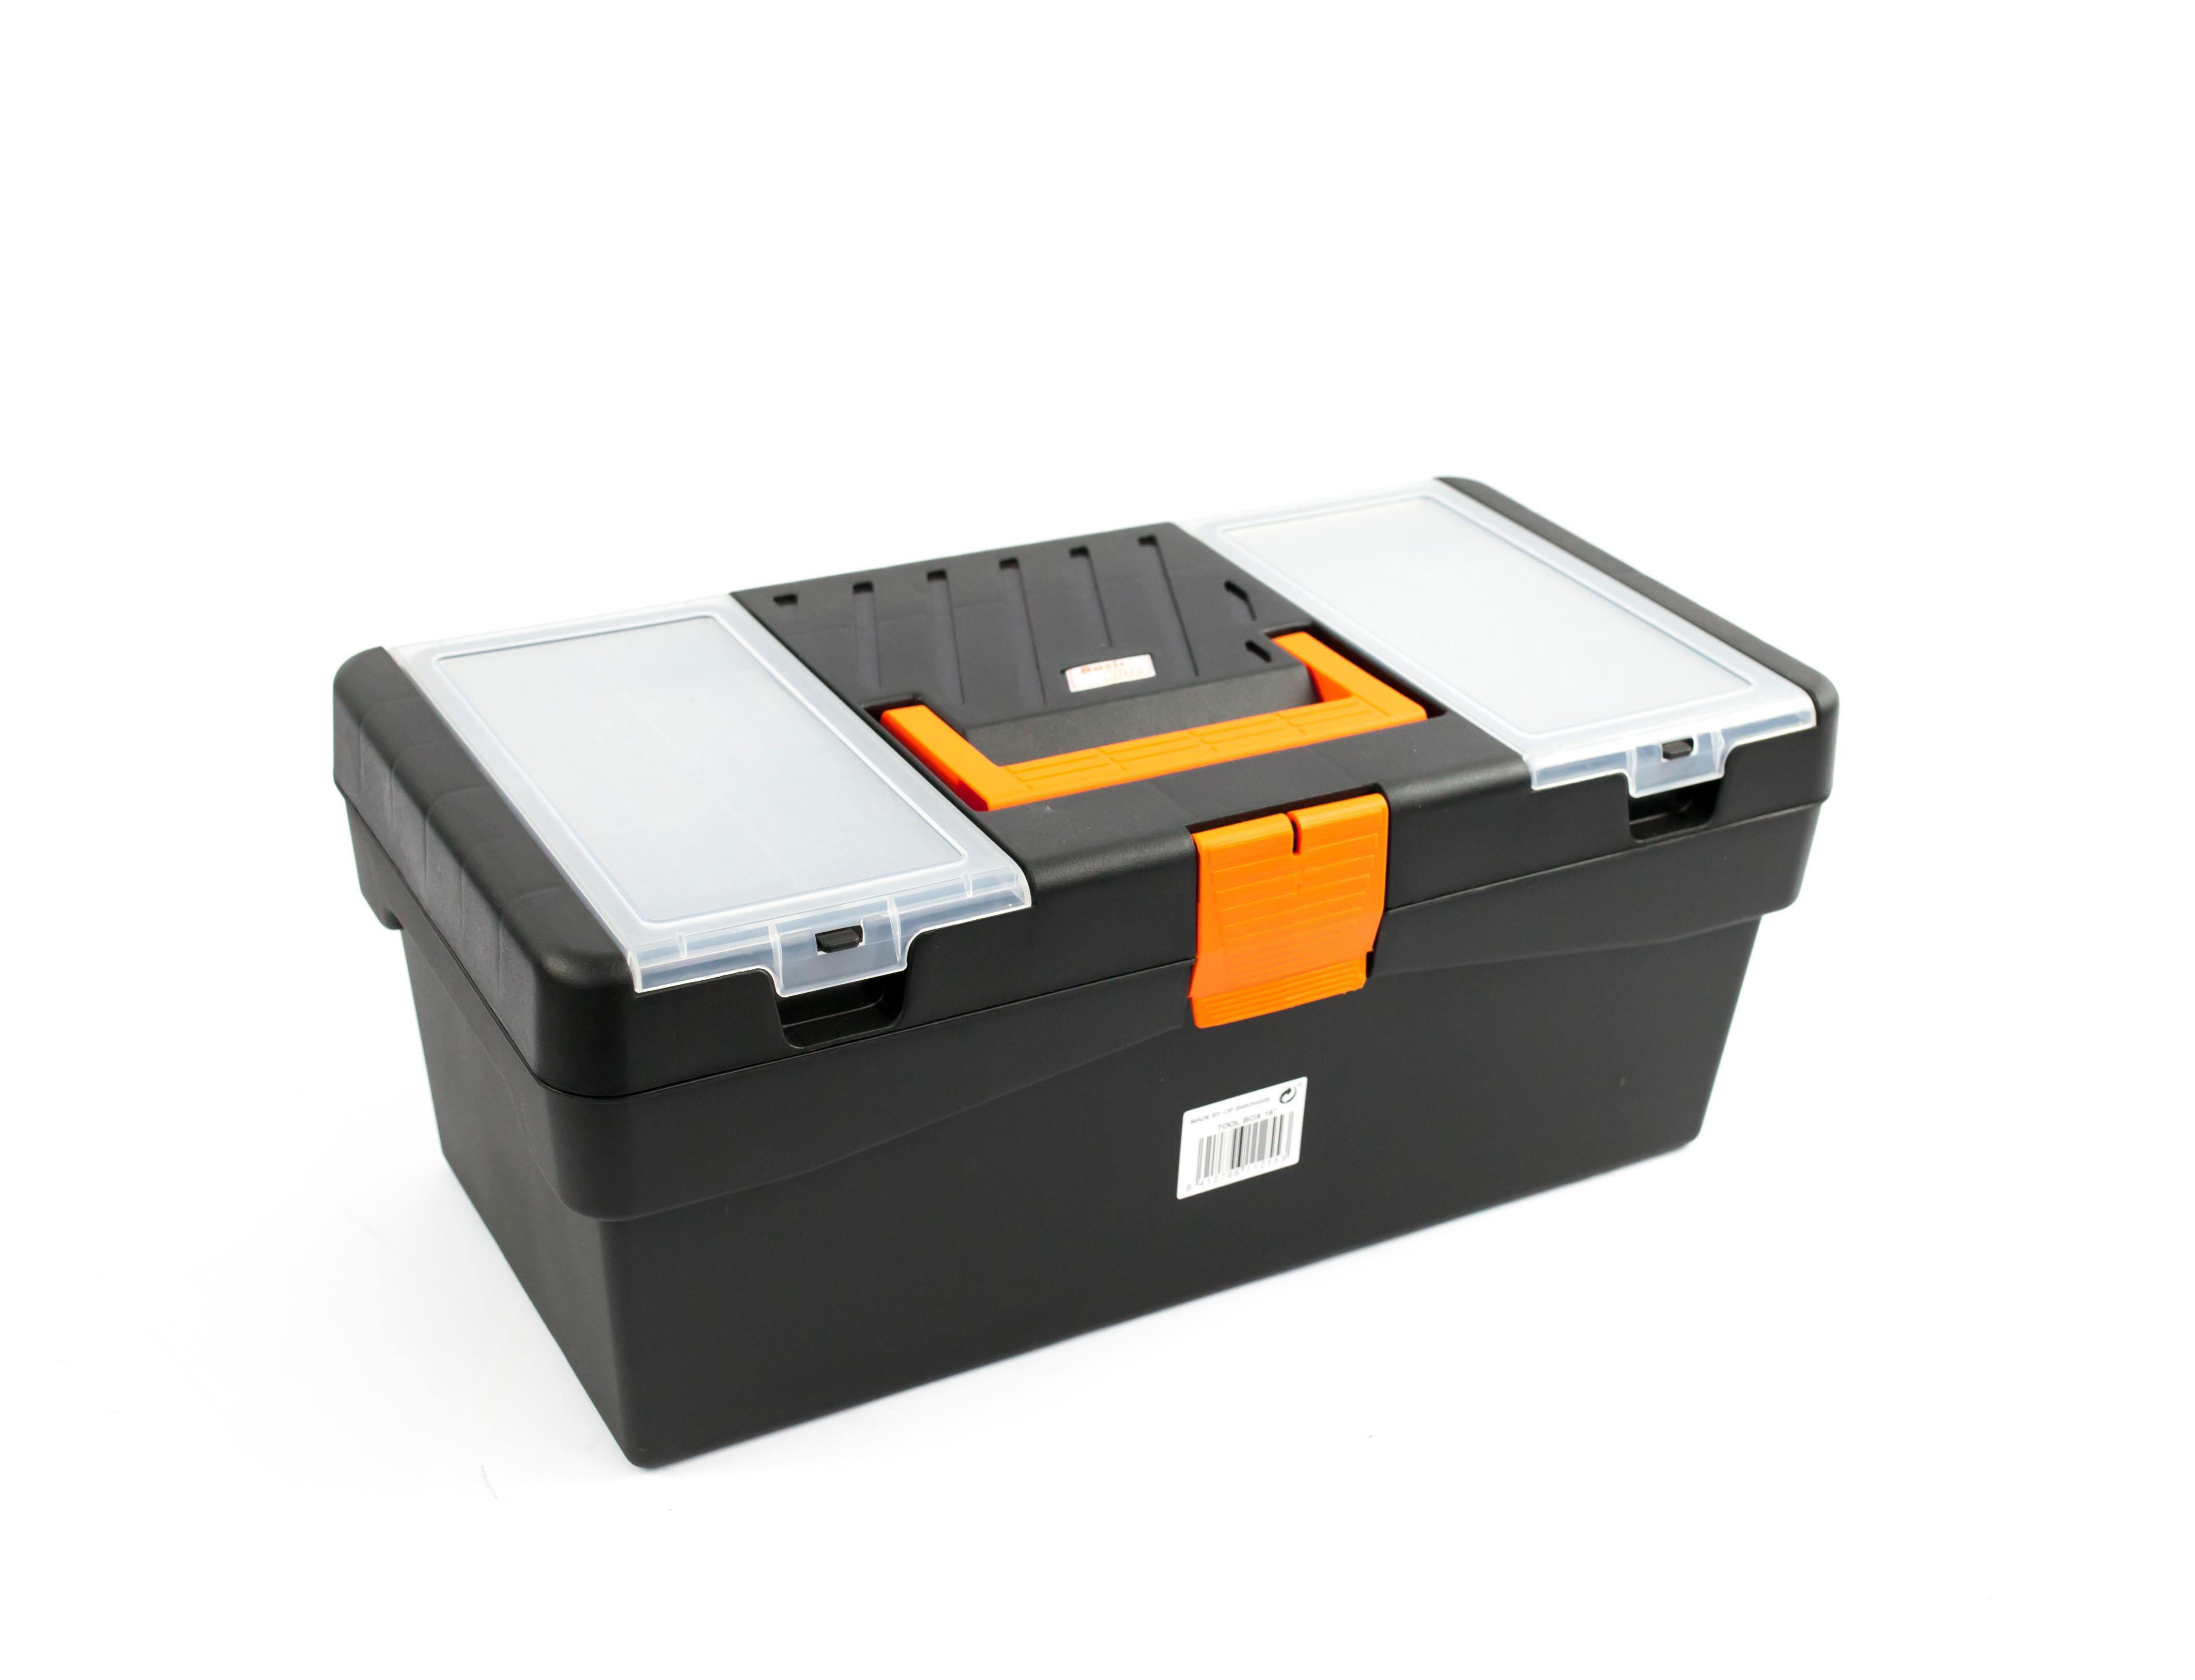 2 caja de herramientas coleccion basica toolbox - Gama Basic Line